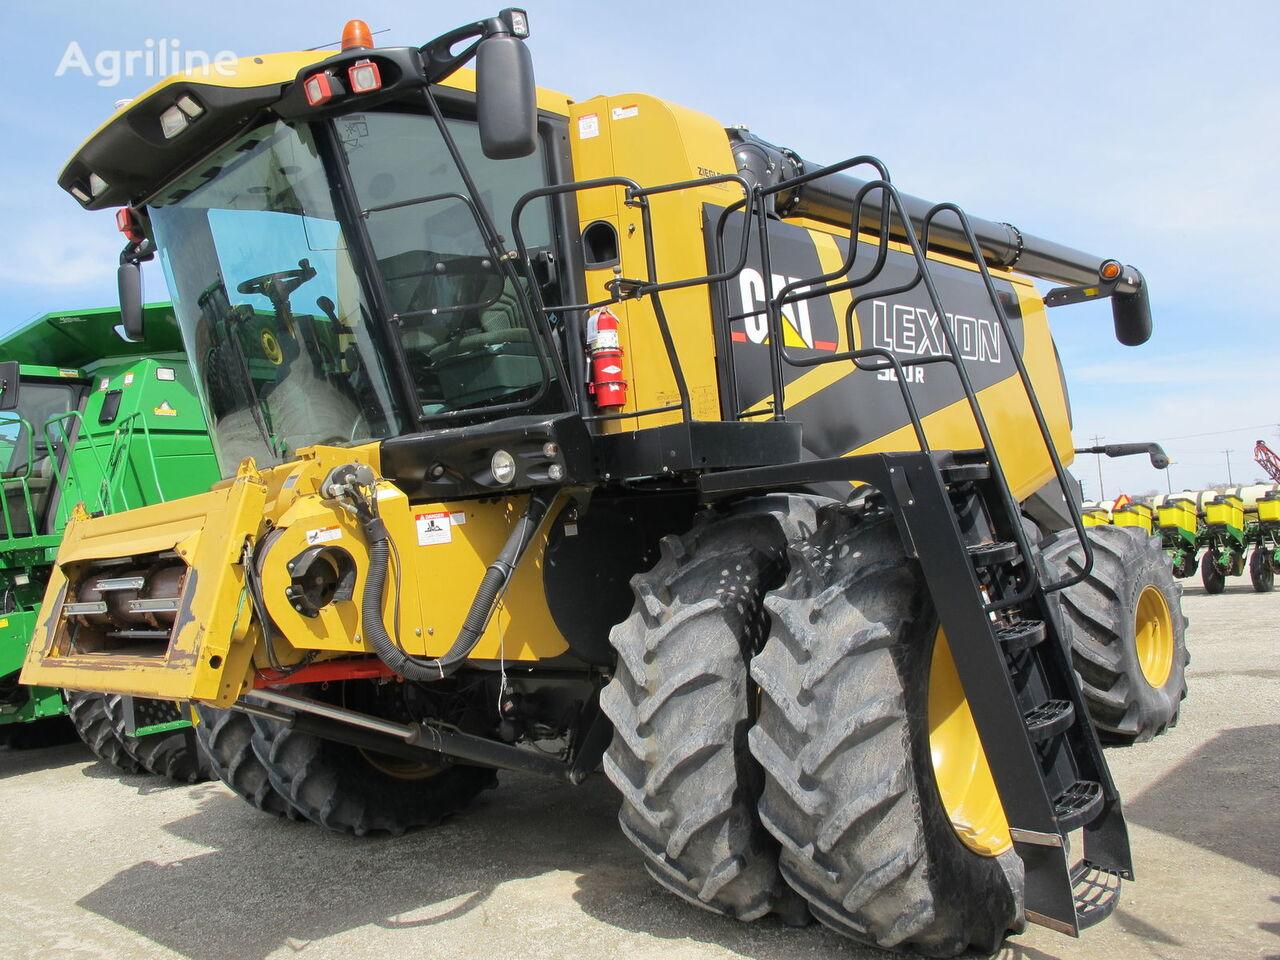 CATERPILLAR Lexion 580 kombajn za žito